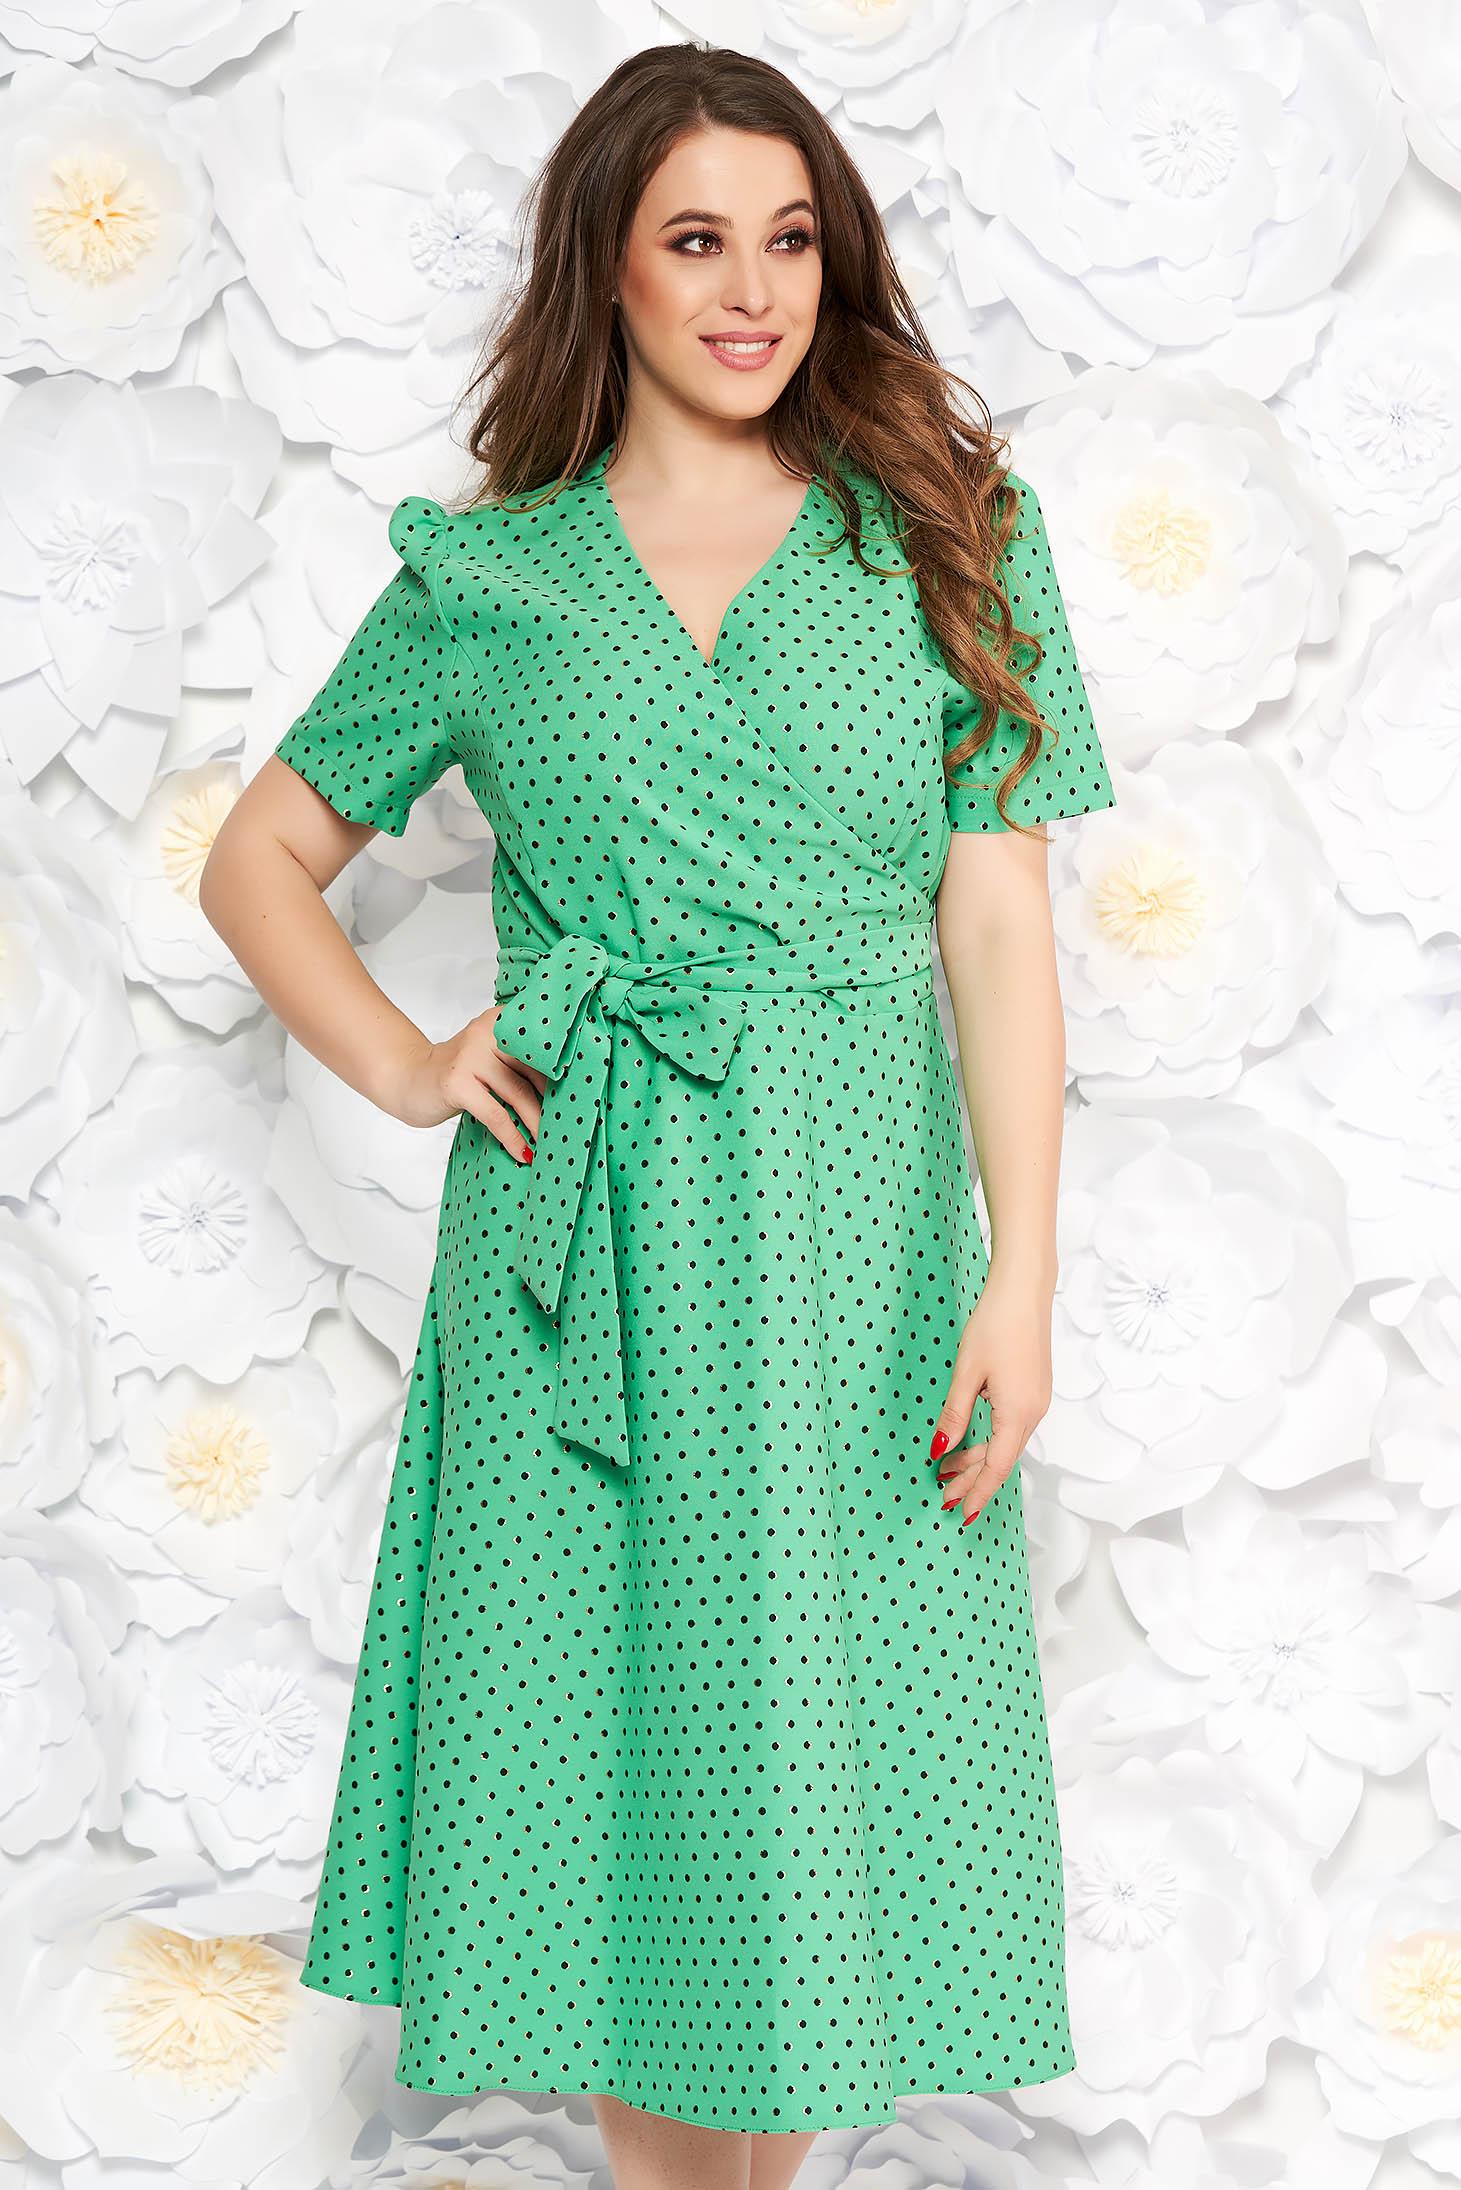 Rochie verde-deschis eleganta in clos din stofa subtire usor elastica cu buline accesorizata cu cordon